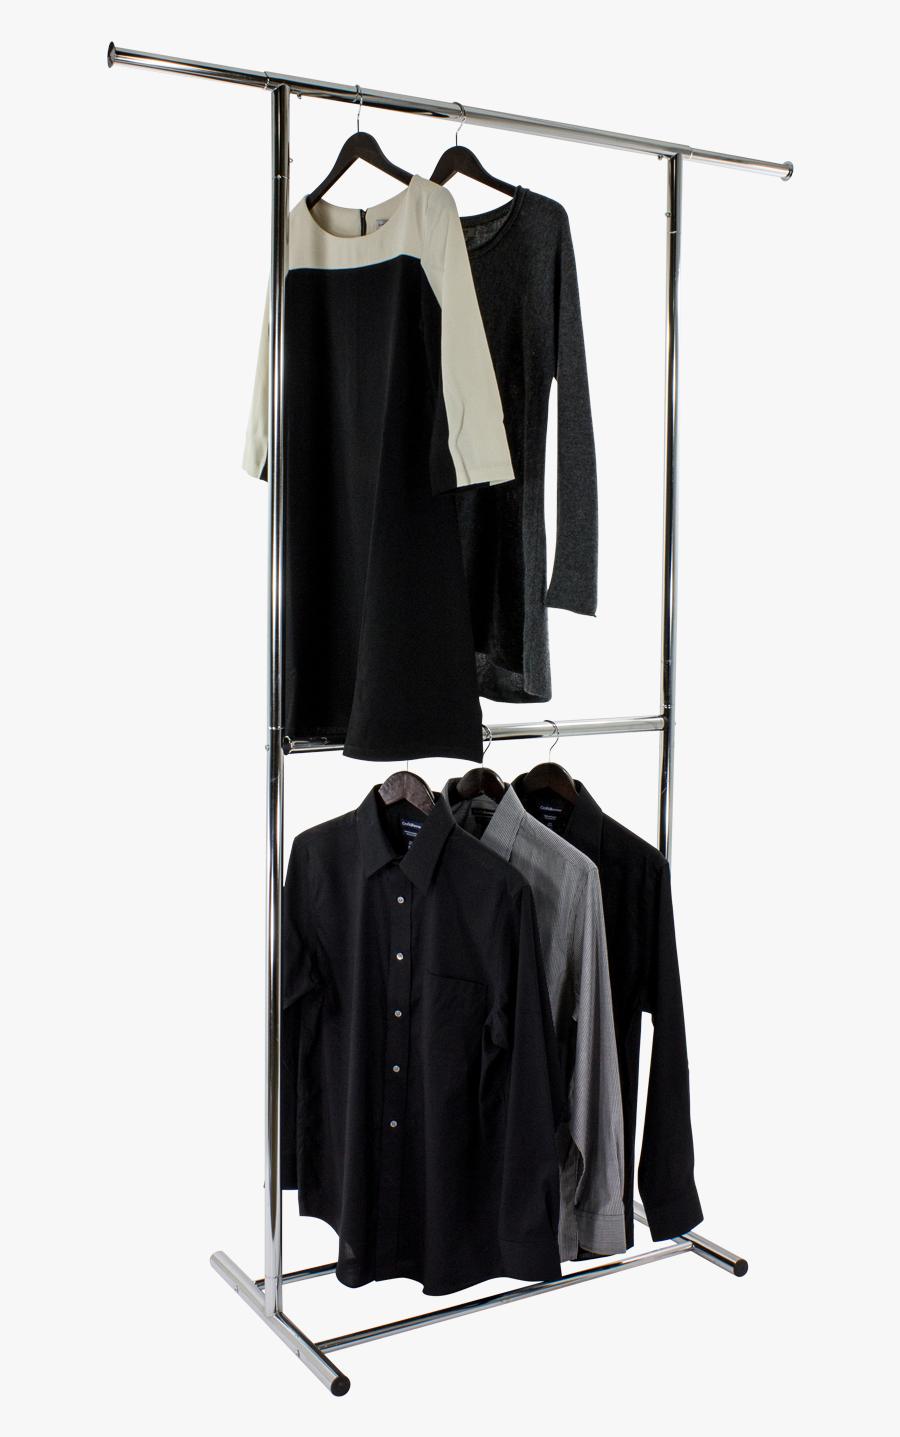 Hanging Clothes Png - Hanging Clothes Rack Transparent, Transparent Clipart